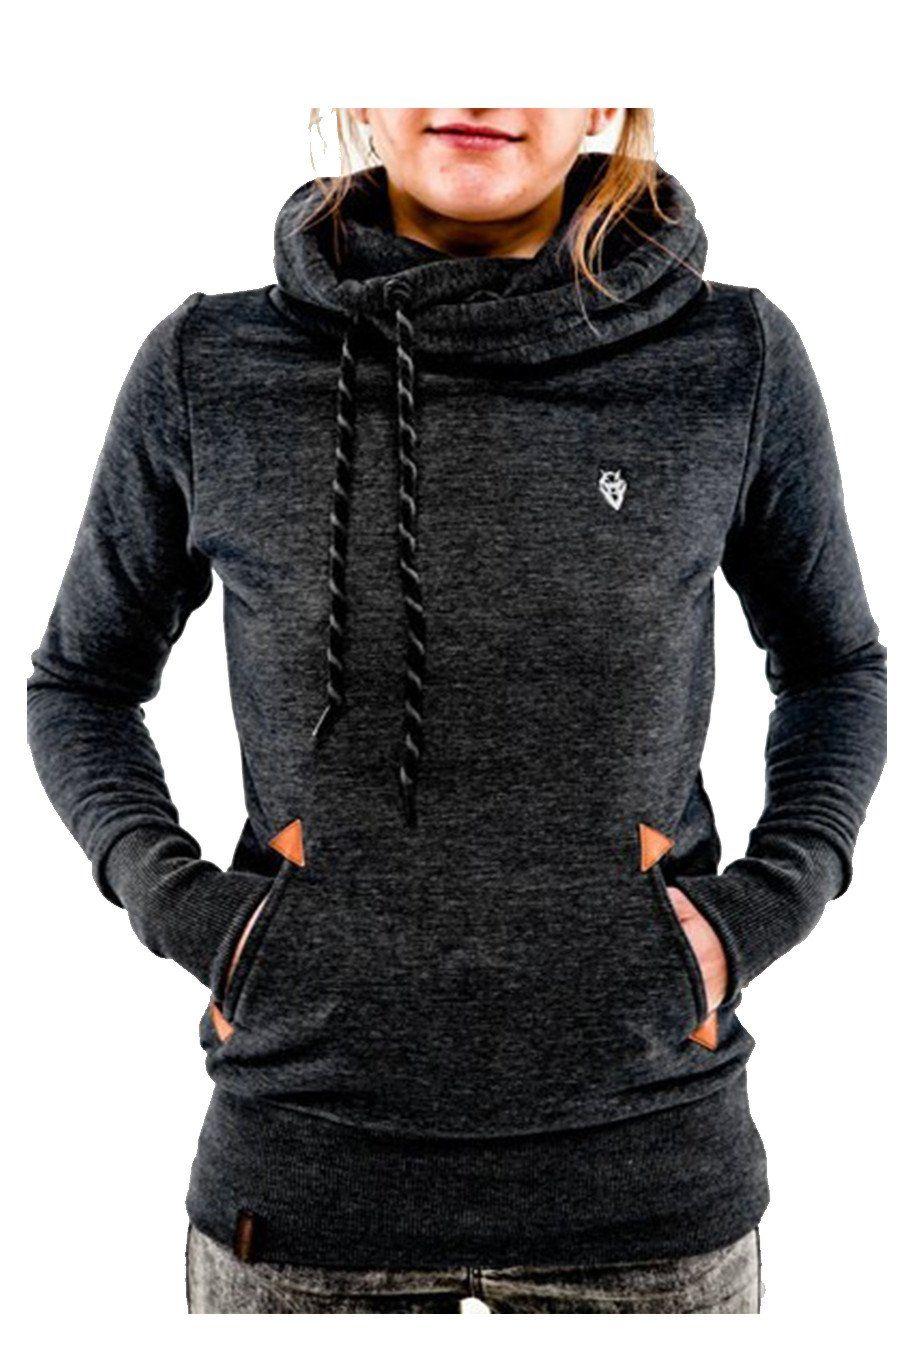 Black Hooded Long Sleeve Turtleneck Sweater